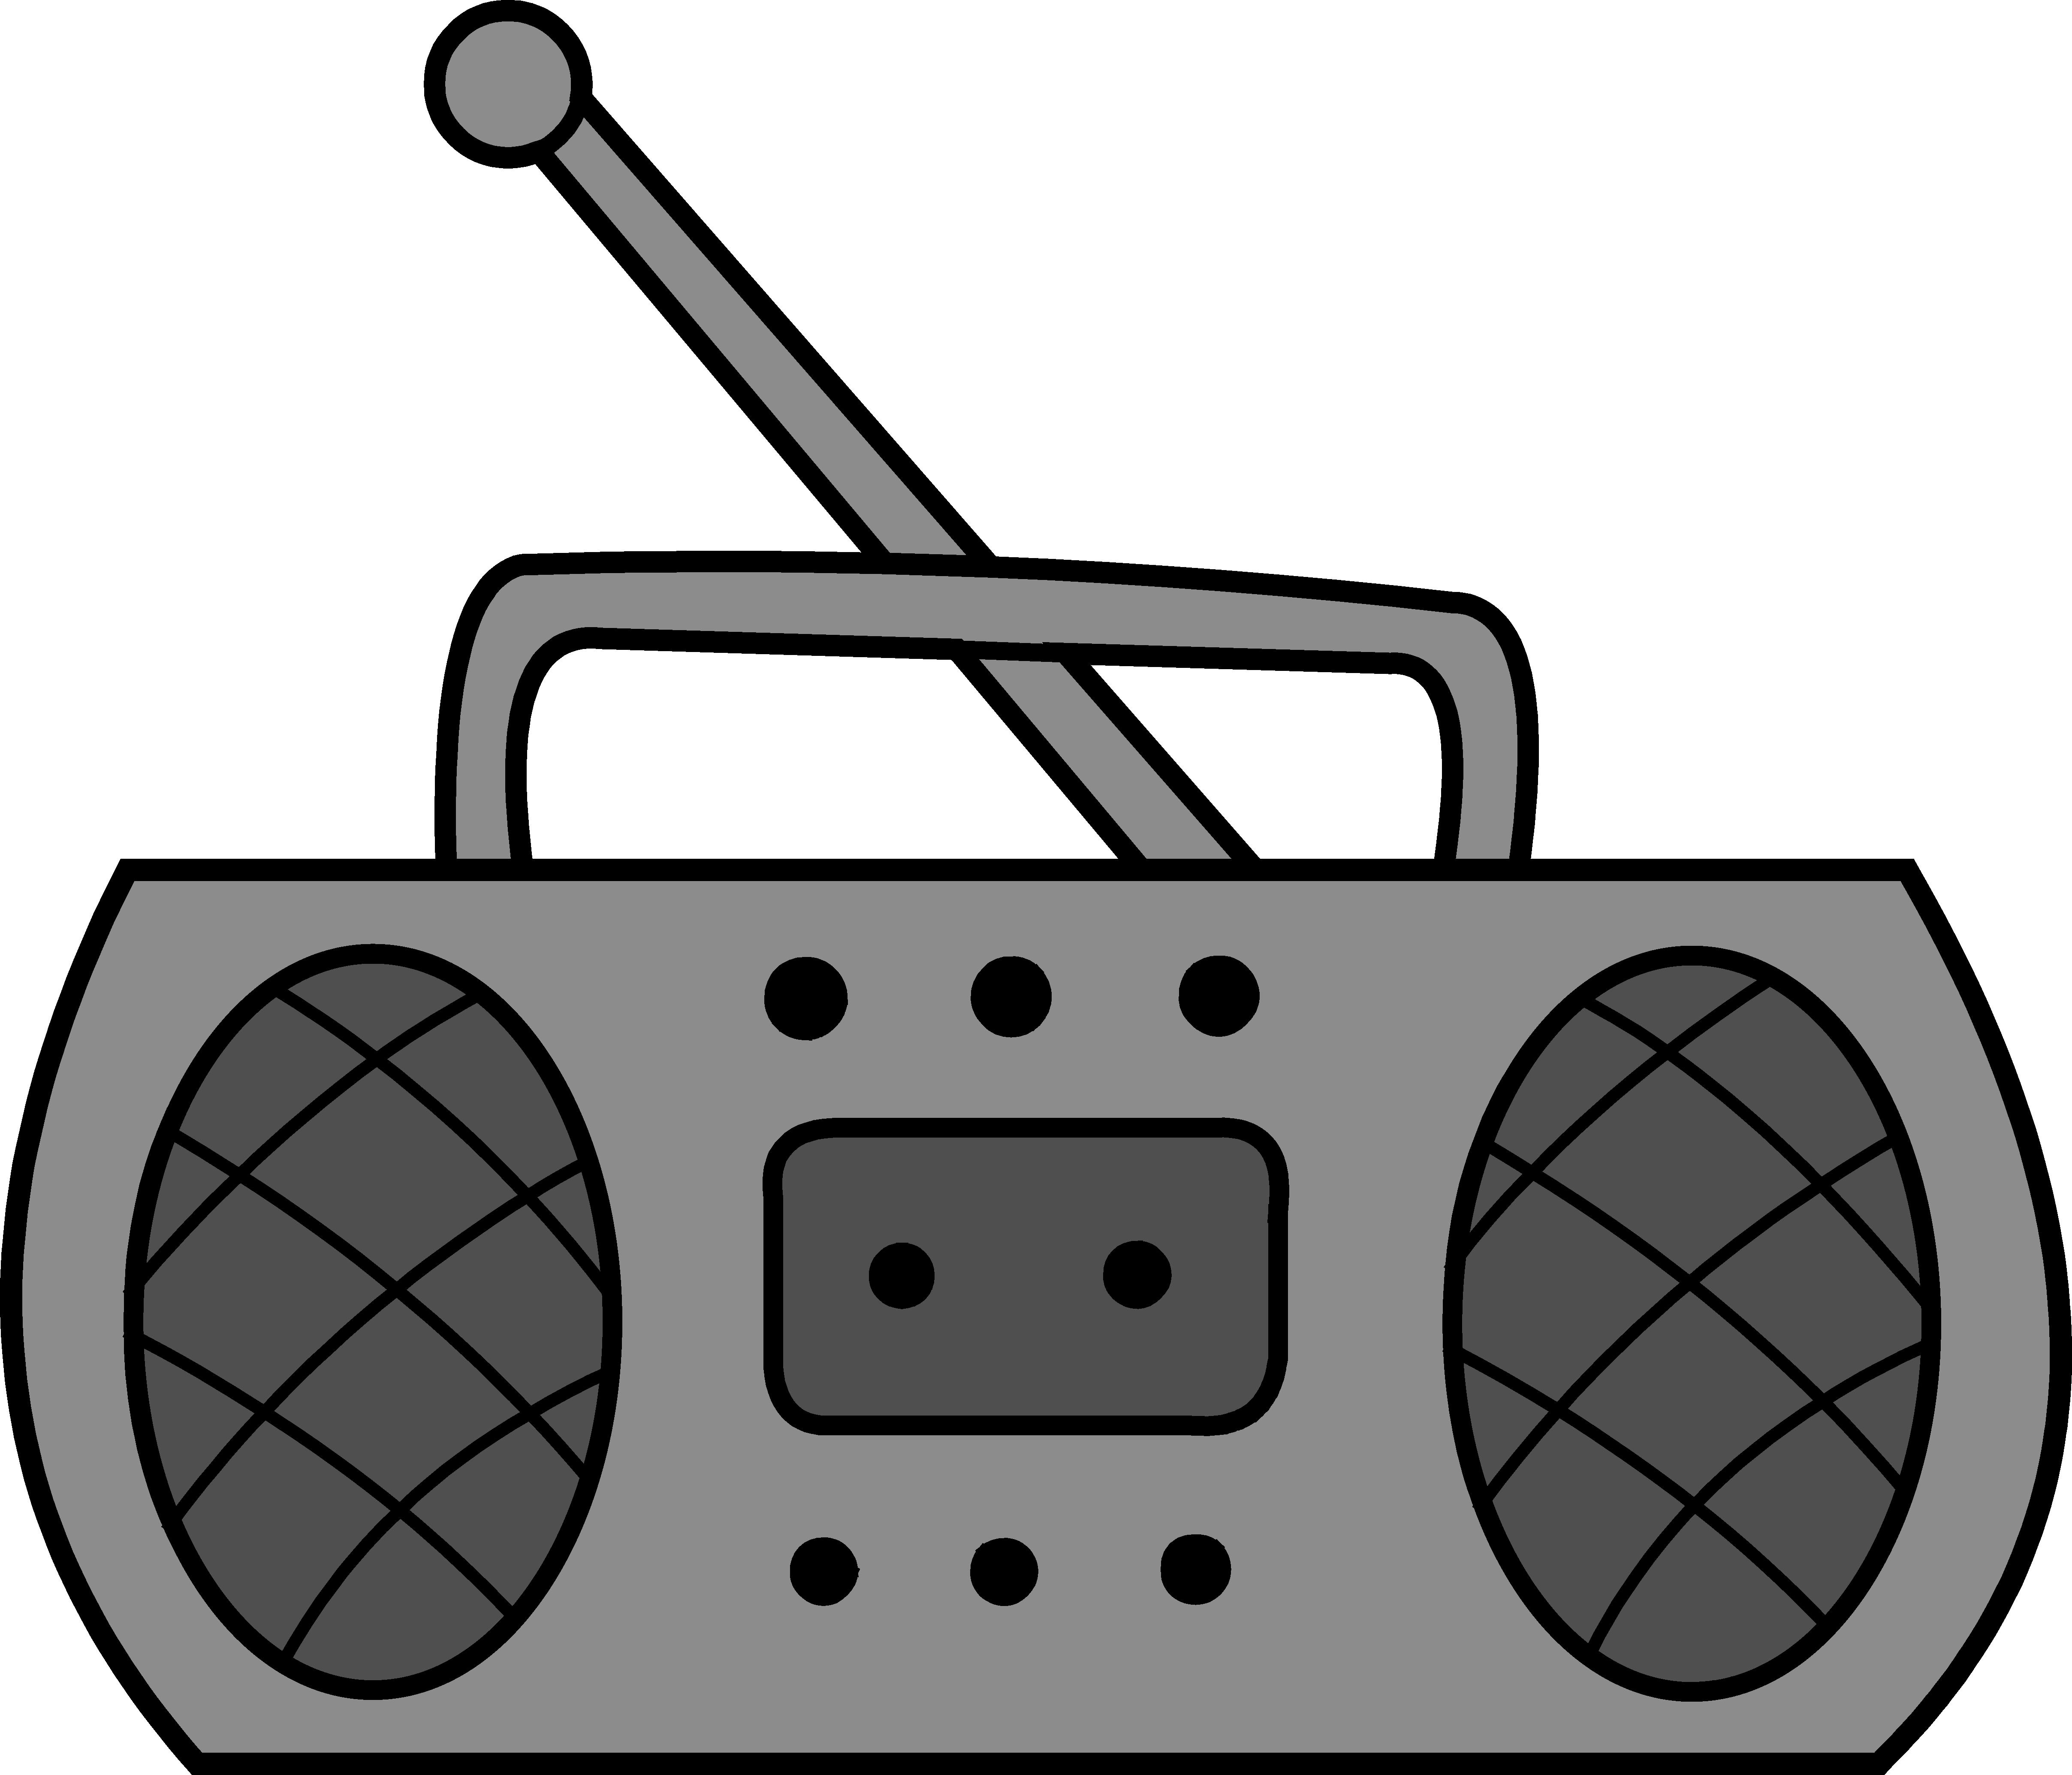 Free Radio Person Cliparts, Download Free Clip Art, Free.